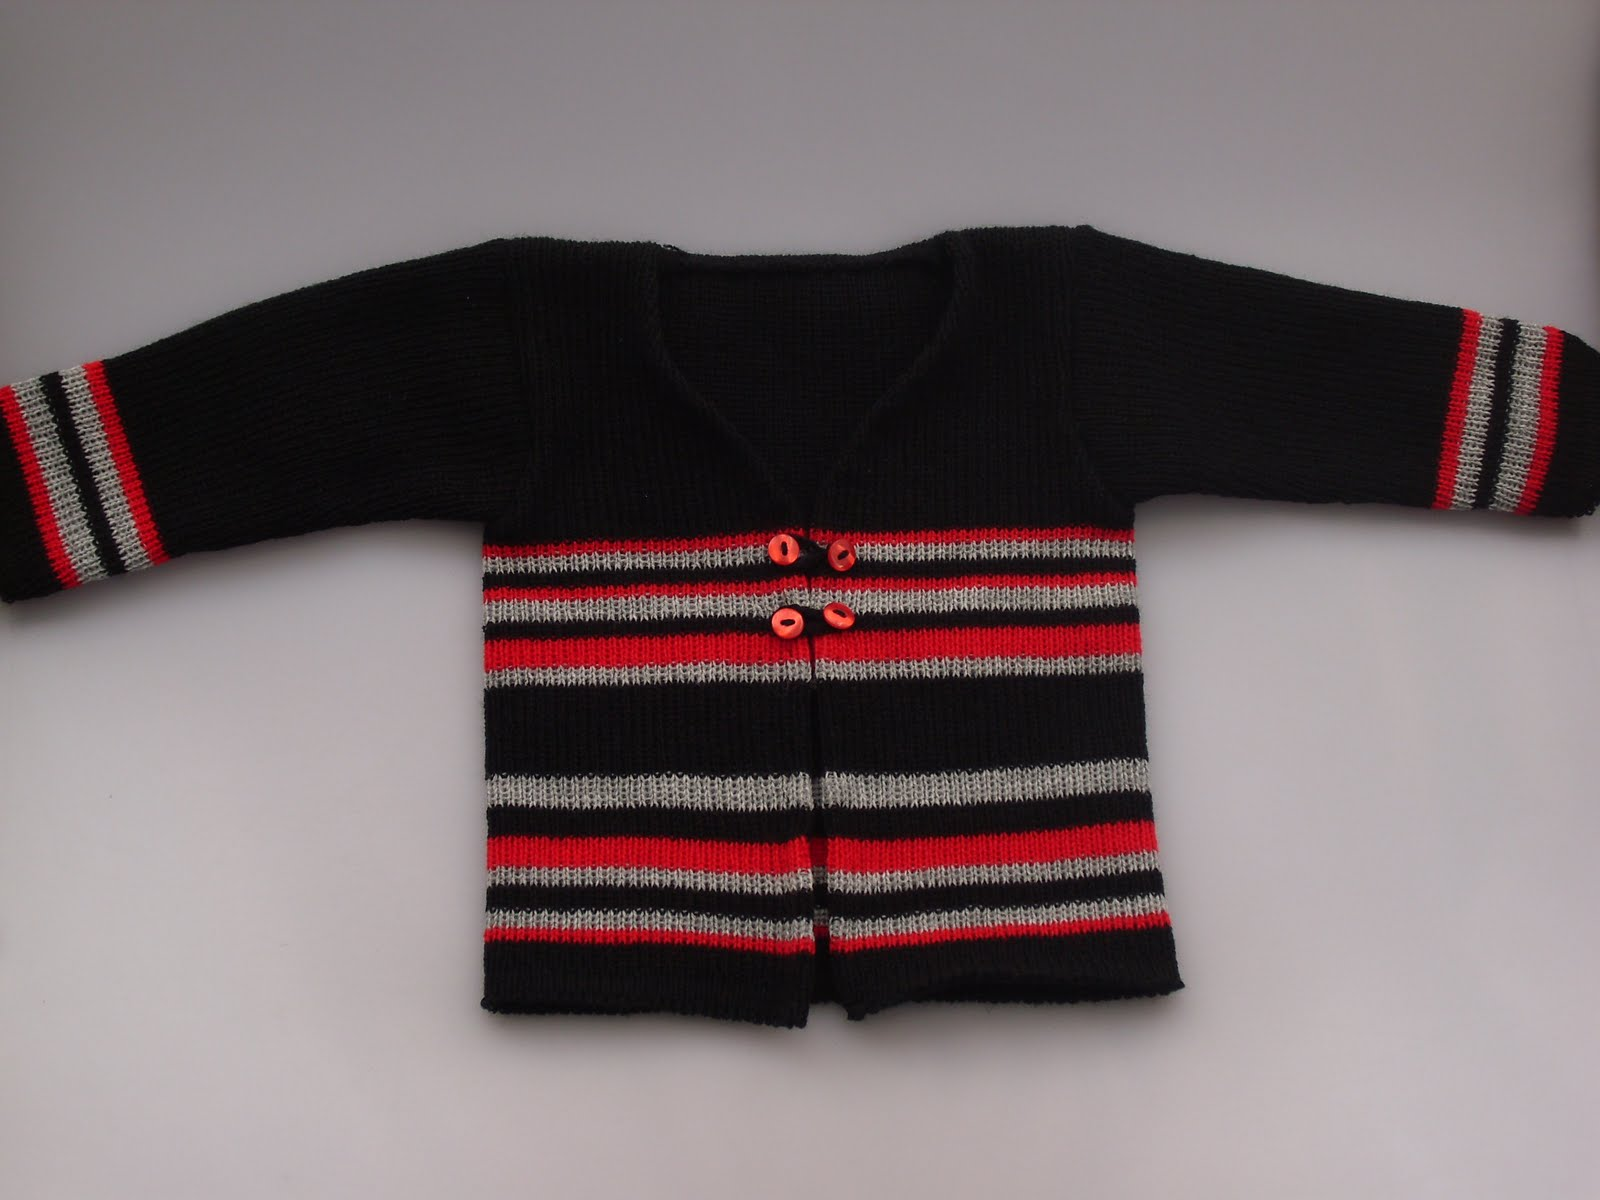 Tejiendo a maquina: jersey para bebe tejido a maquina